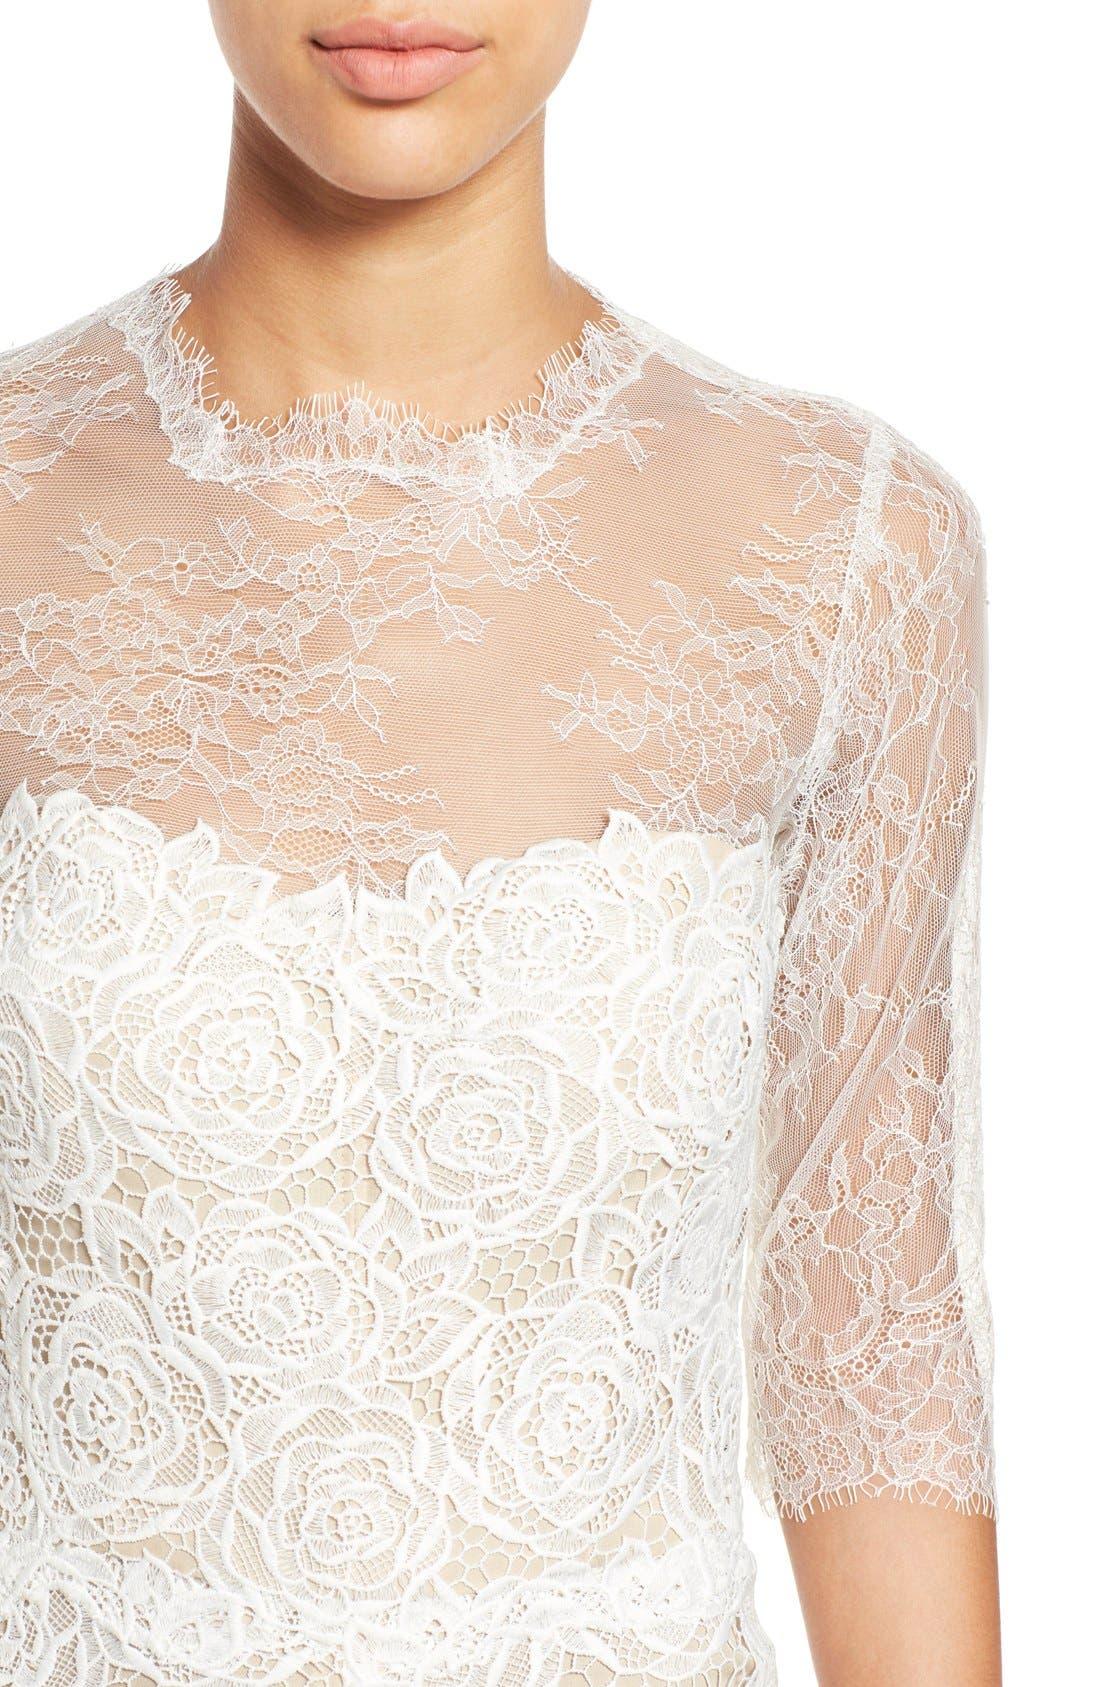 Monique Lhuillier Ready to Wed Guipure Lace Jumpsuit,                             Alternate thumbnail 4, color,                             Silk White/ Nude